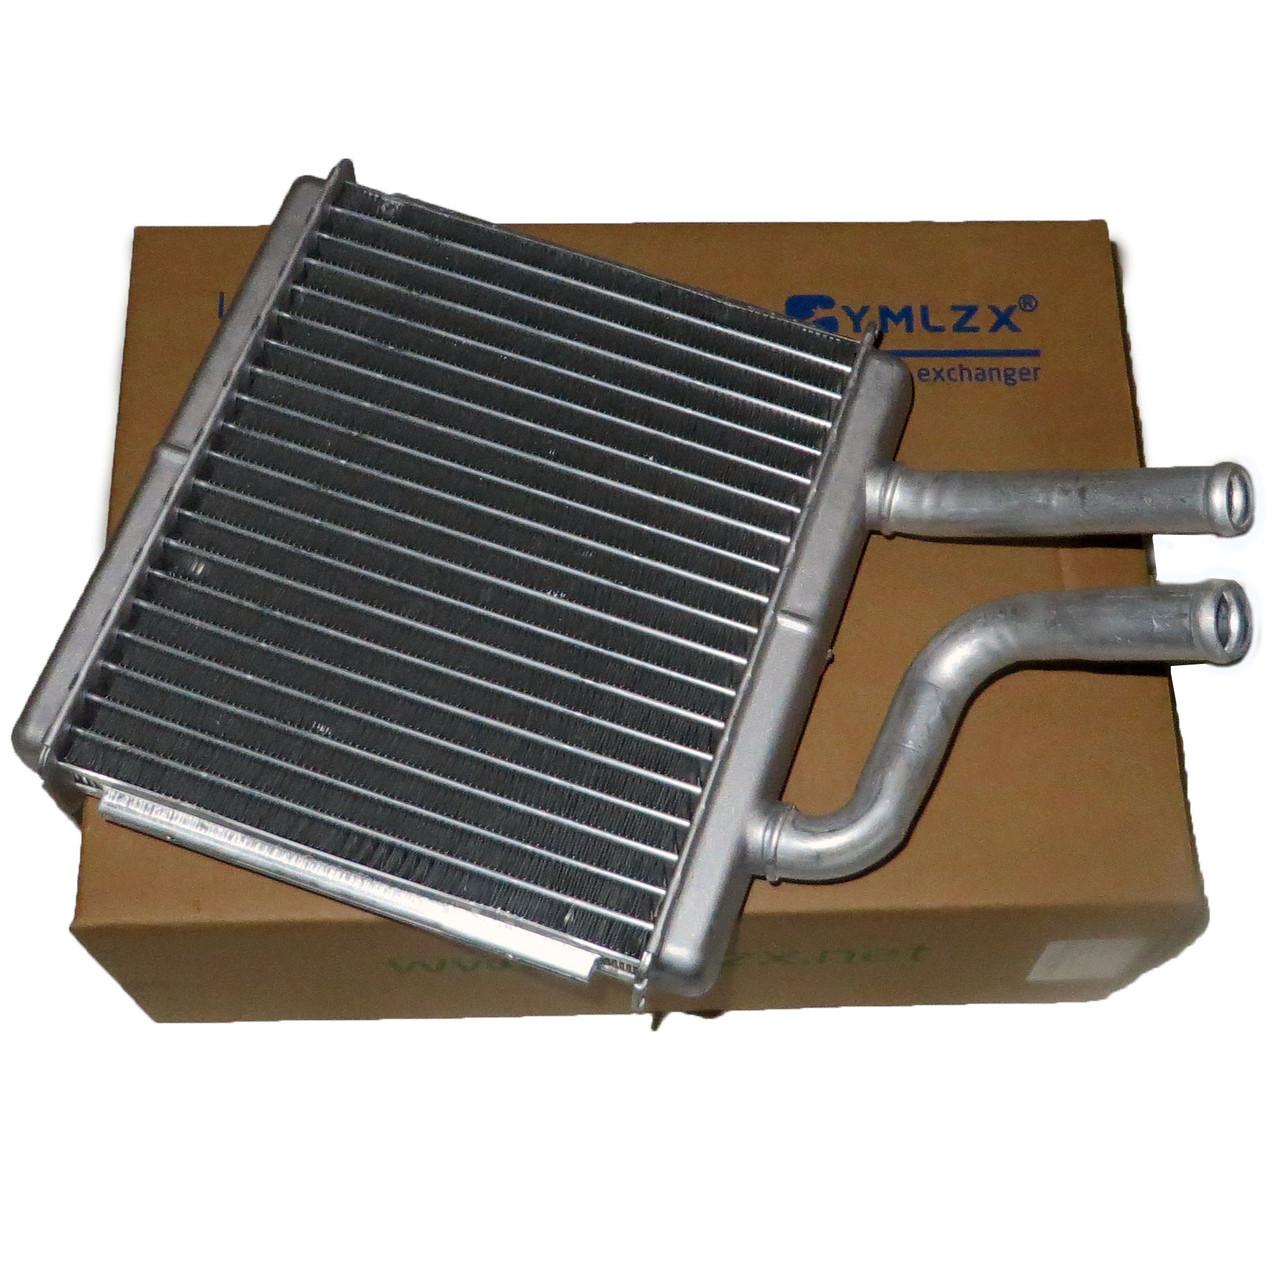 Радиатор печки Такума, YMLZX, YML-BH-142, 96331063-